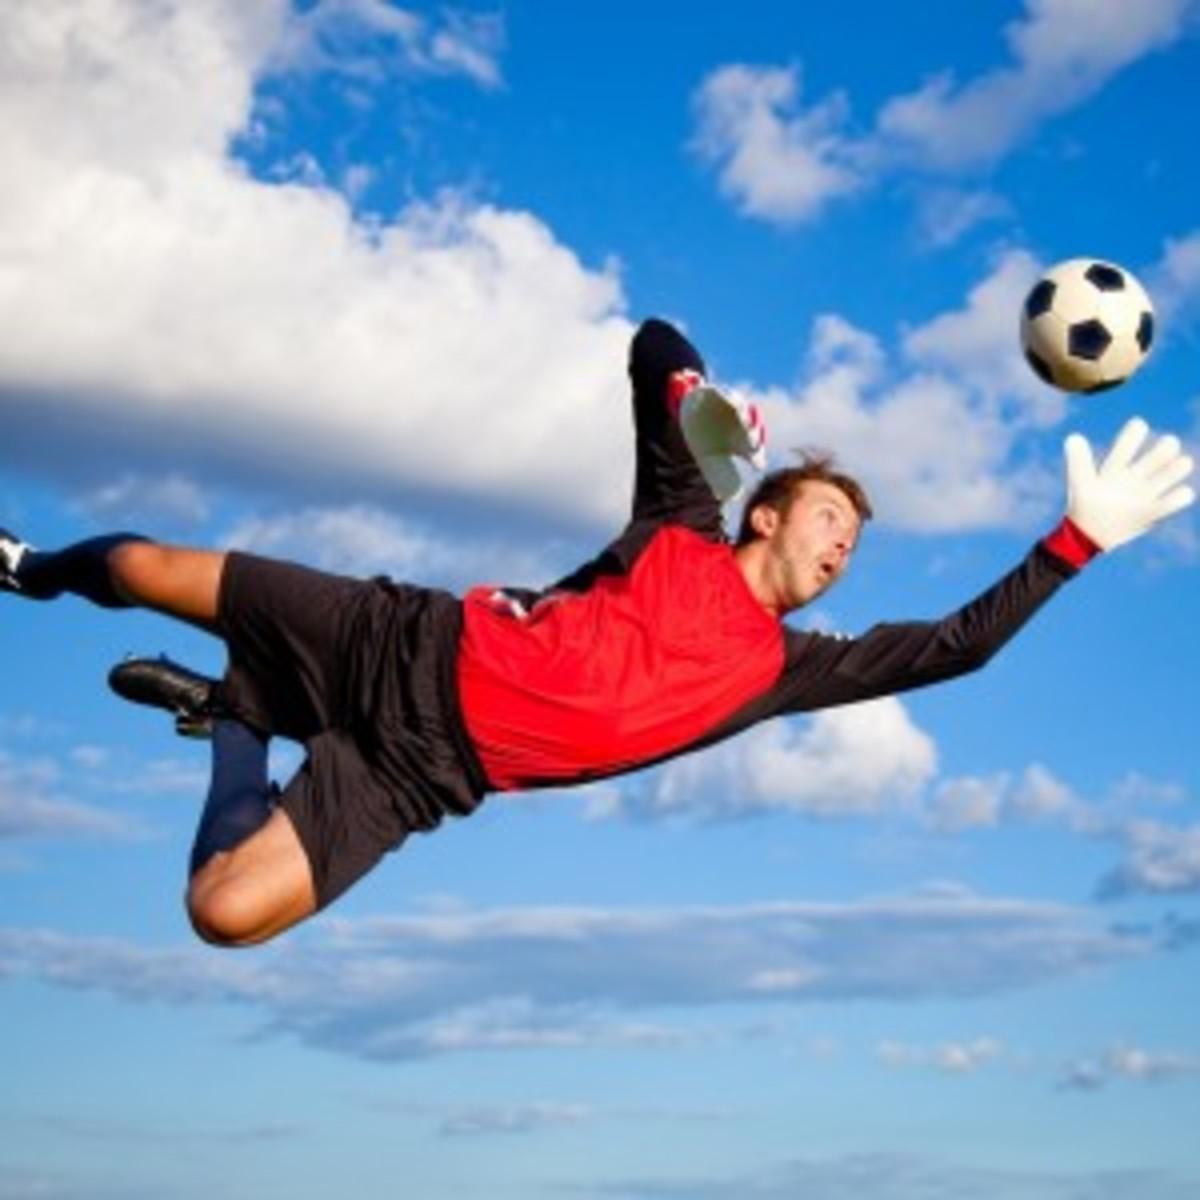 Flying soccer player wearing baggies